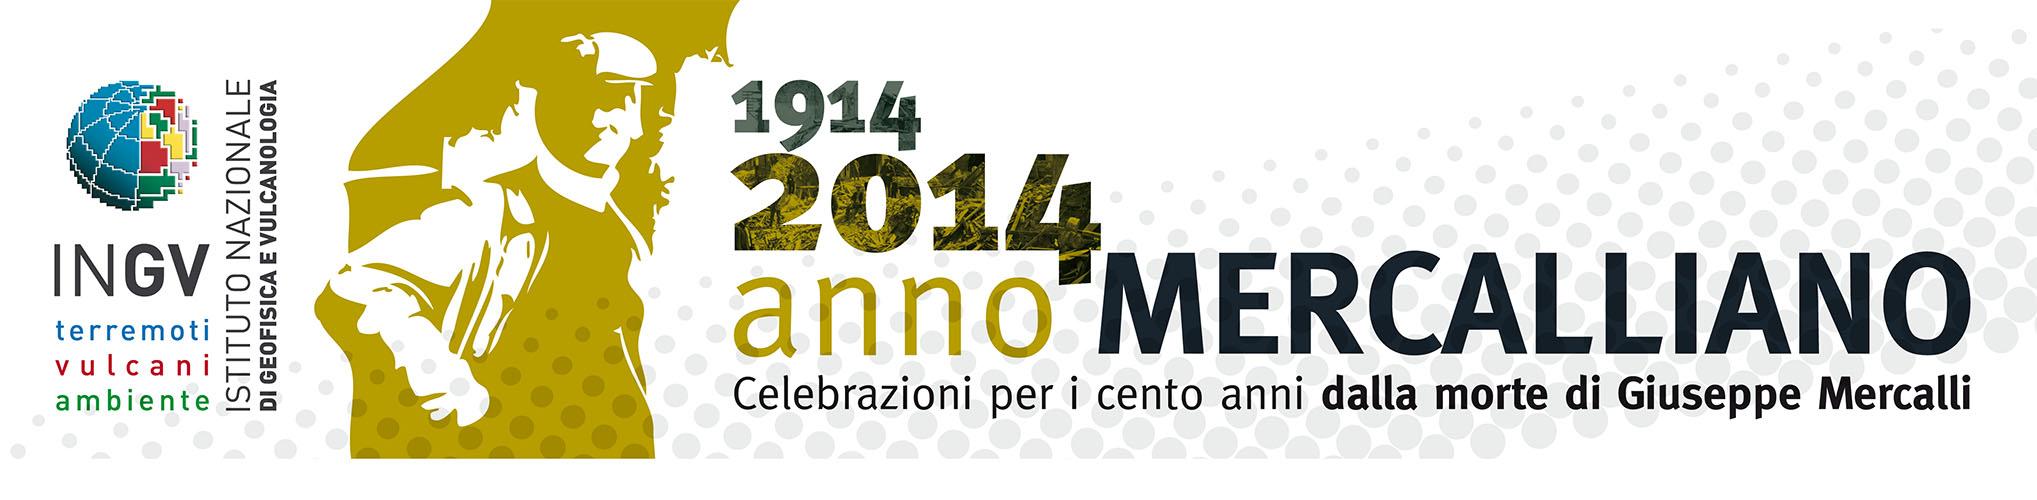 mercalli-centenaio-2014